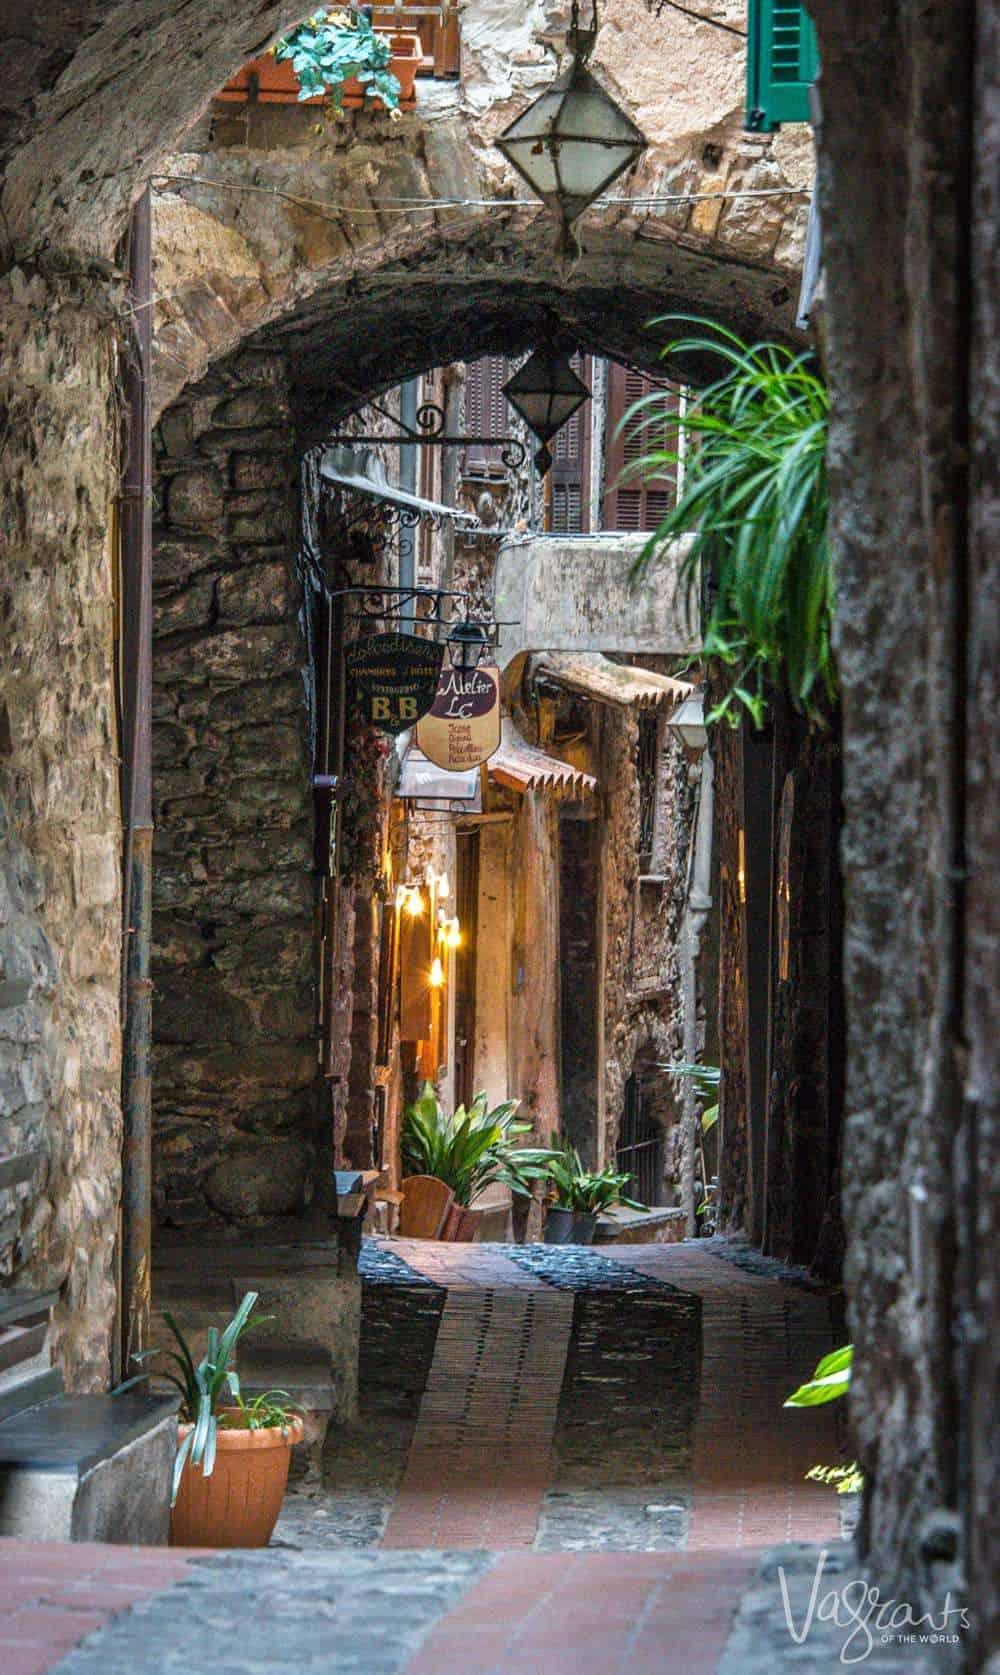 Self catering accommodation near the Ligurian coast Italy